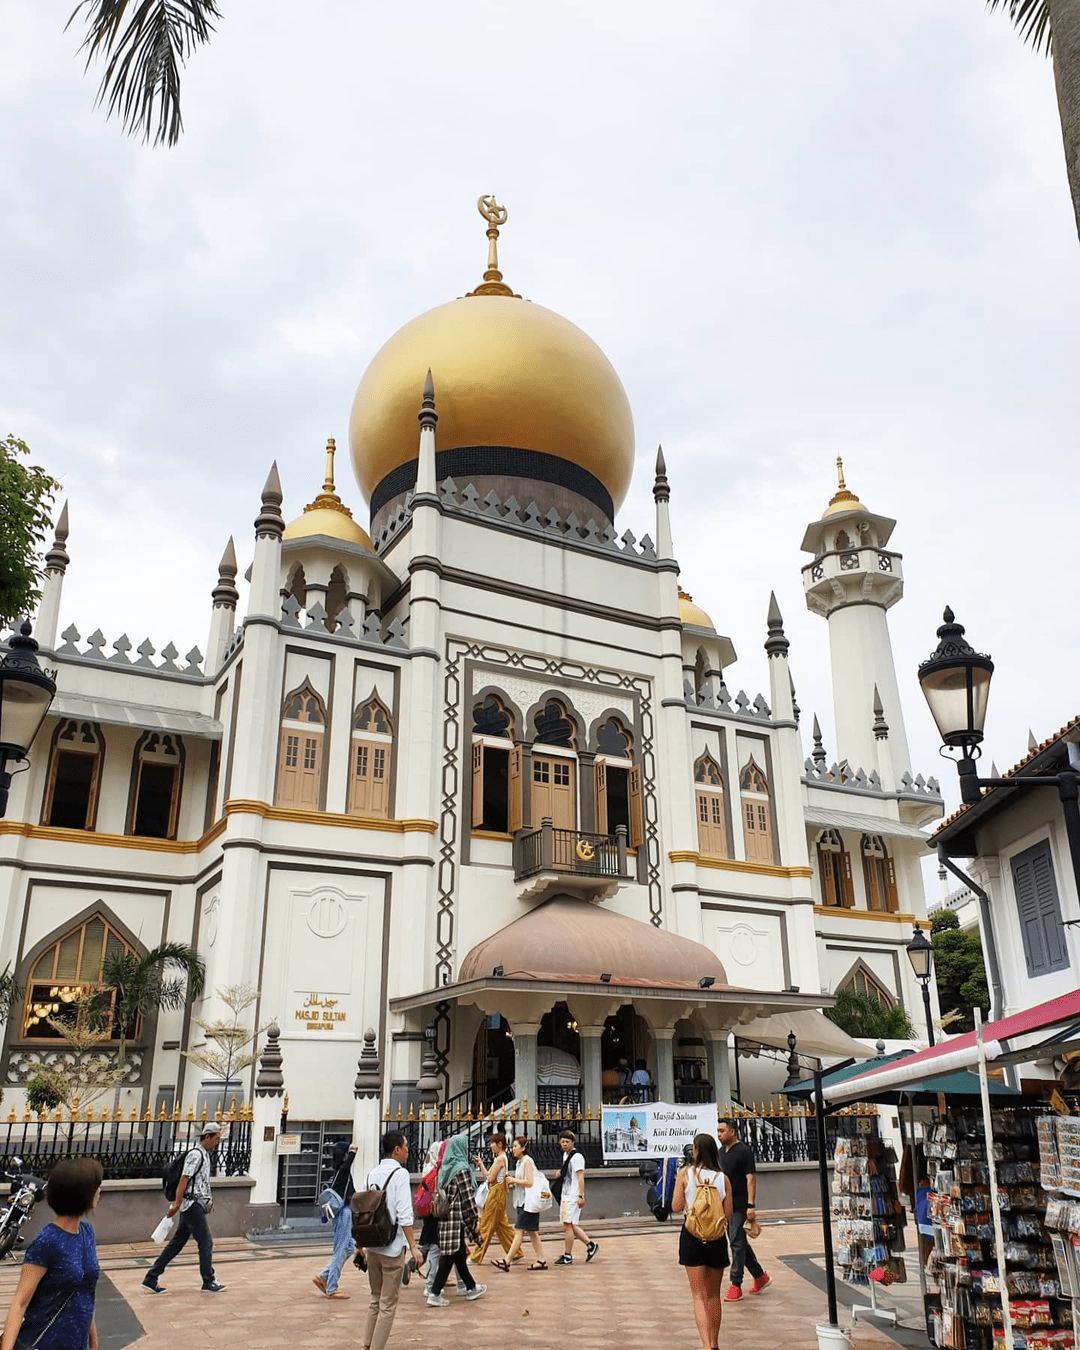 Sultan Mosque - Today